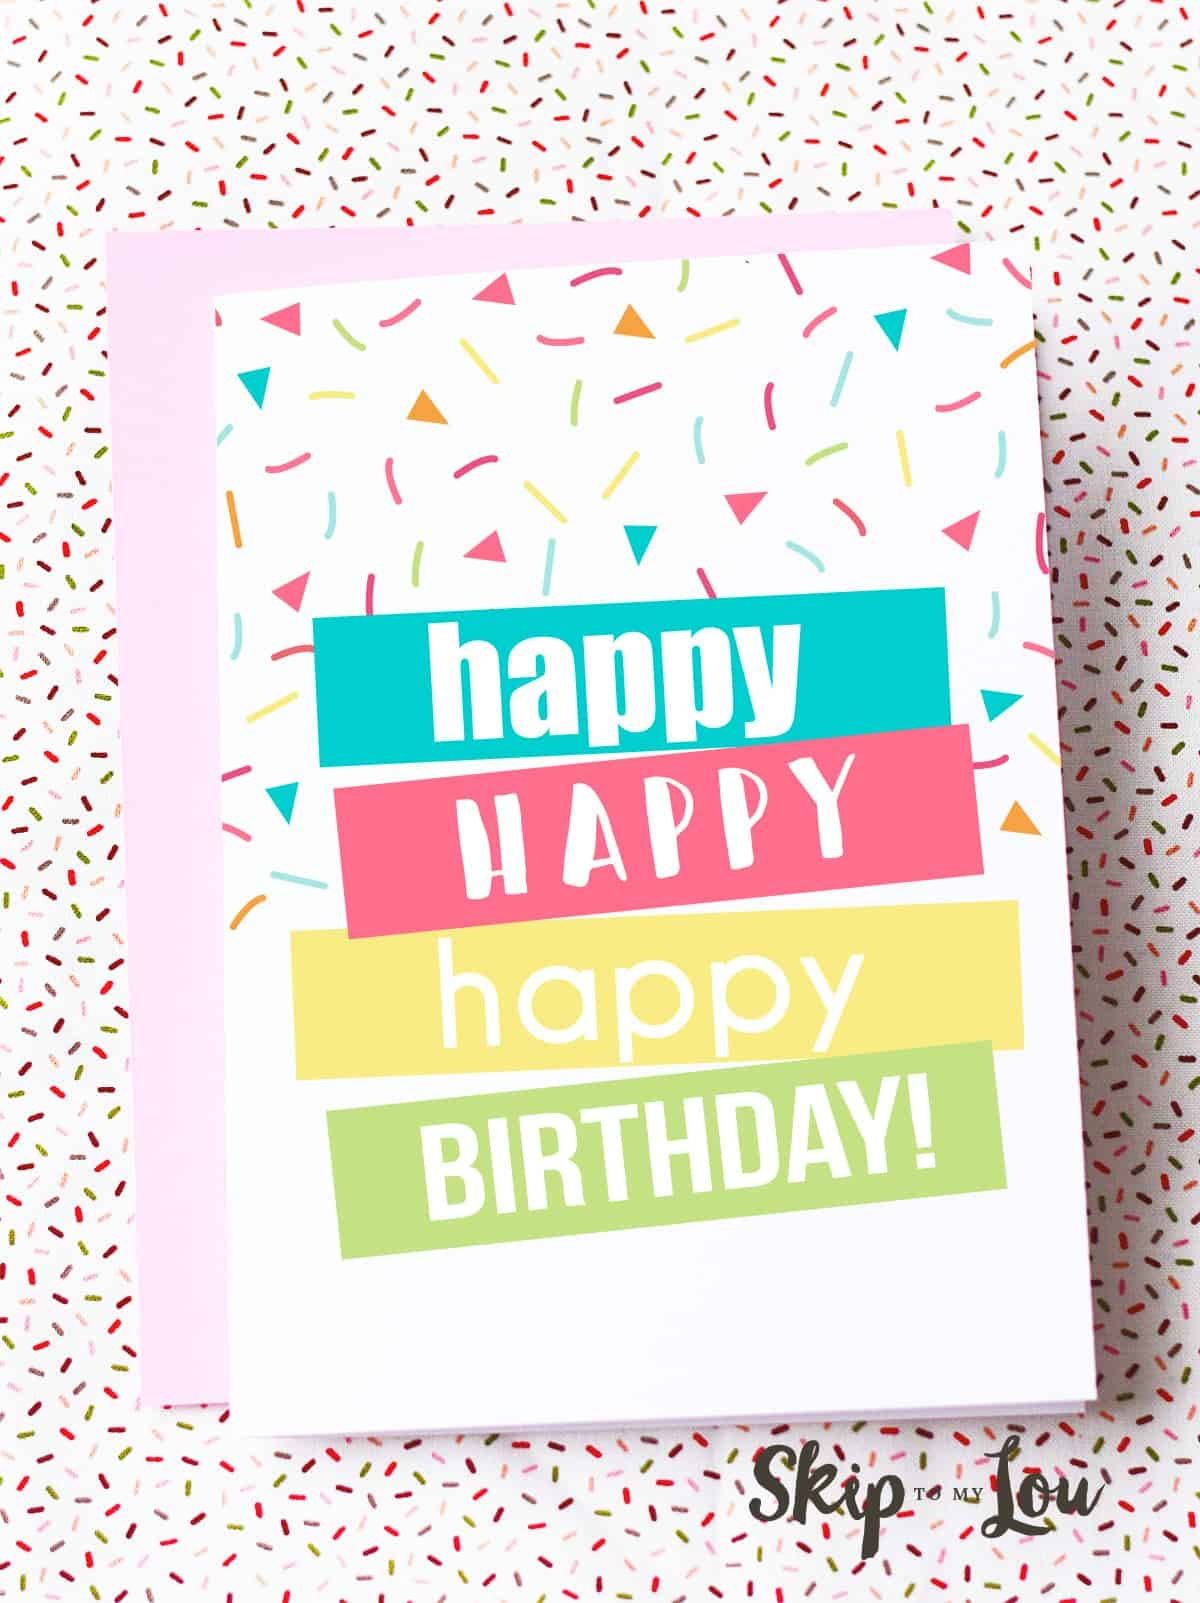 Free Printable Birthday Cards | Skip To My Lou - Happy Birthday Free Cards Printable